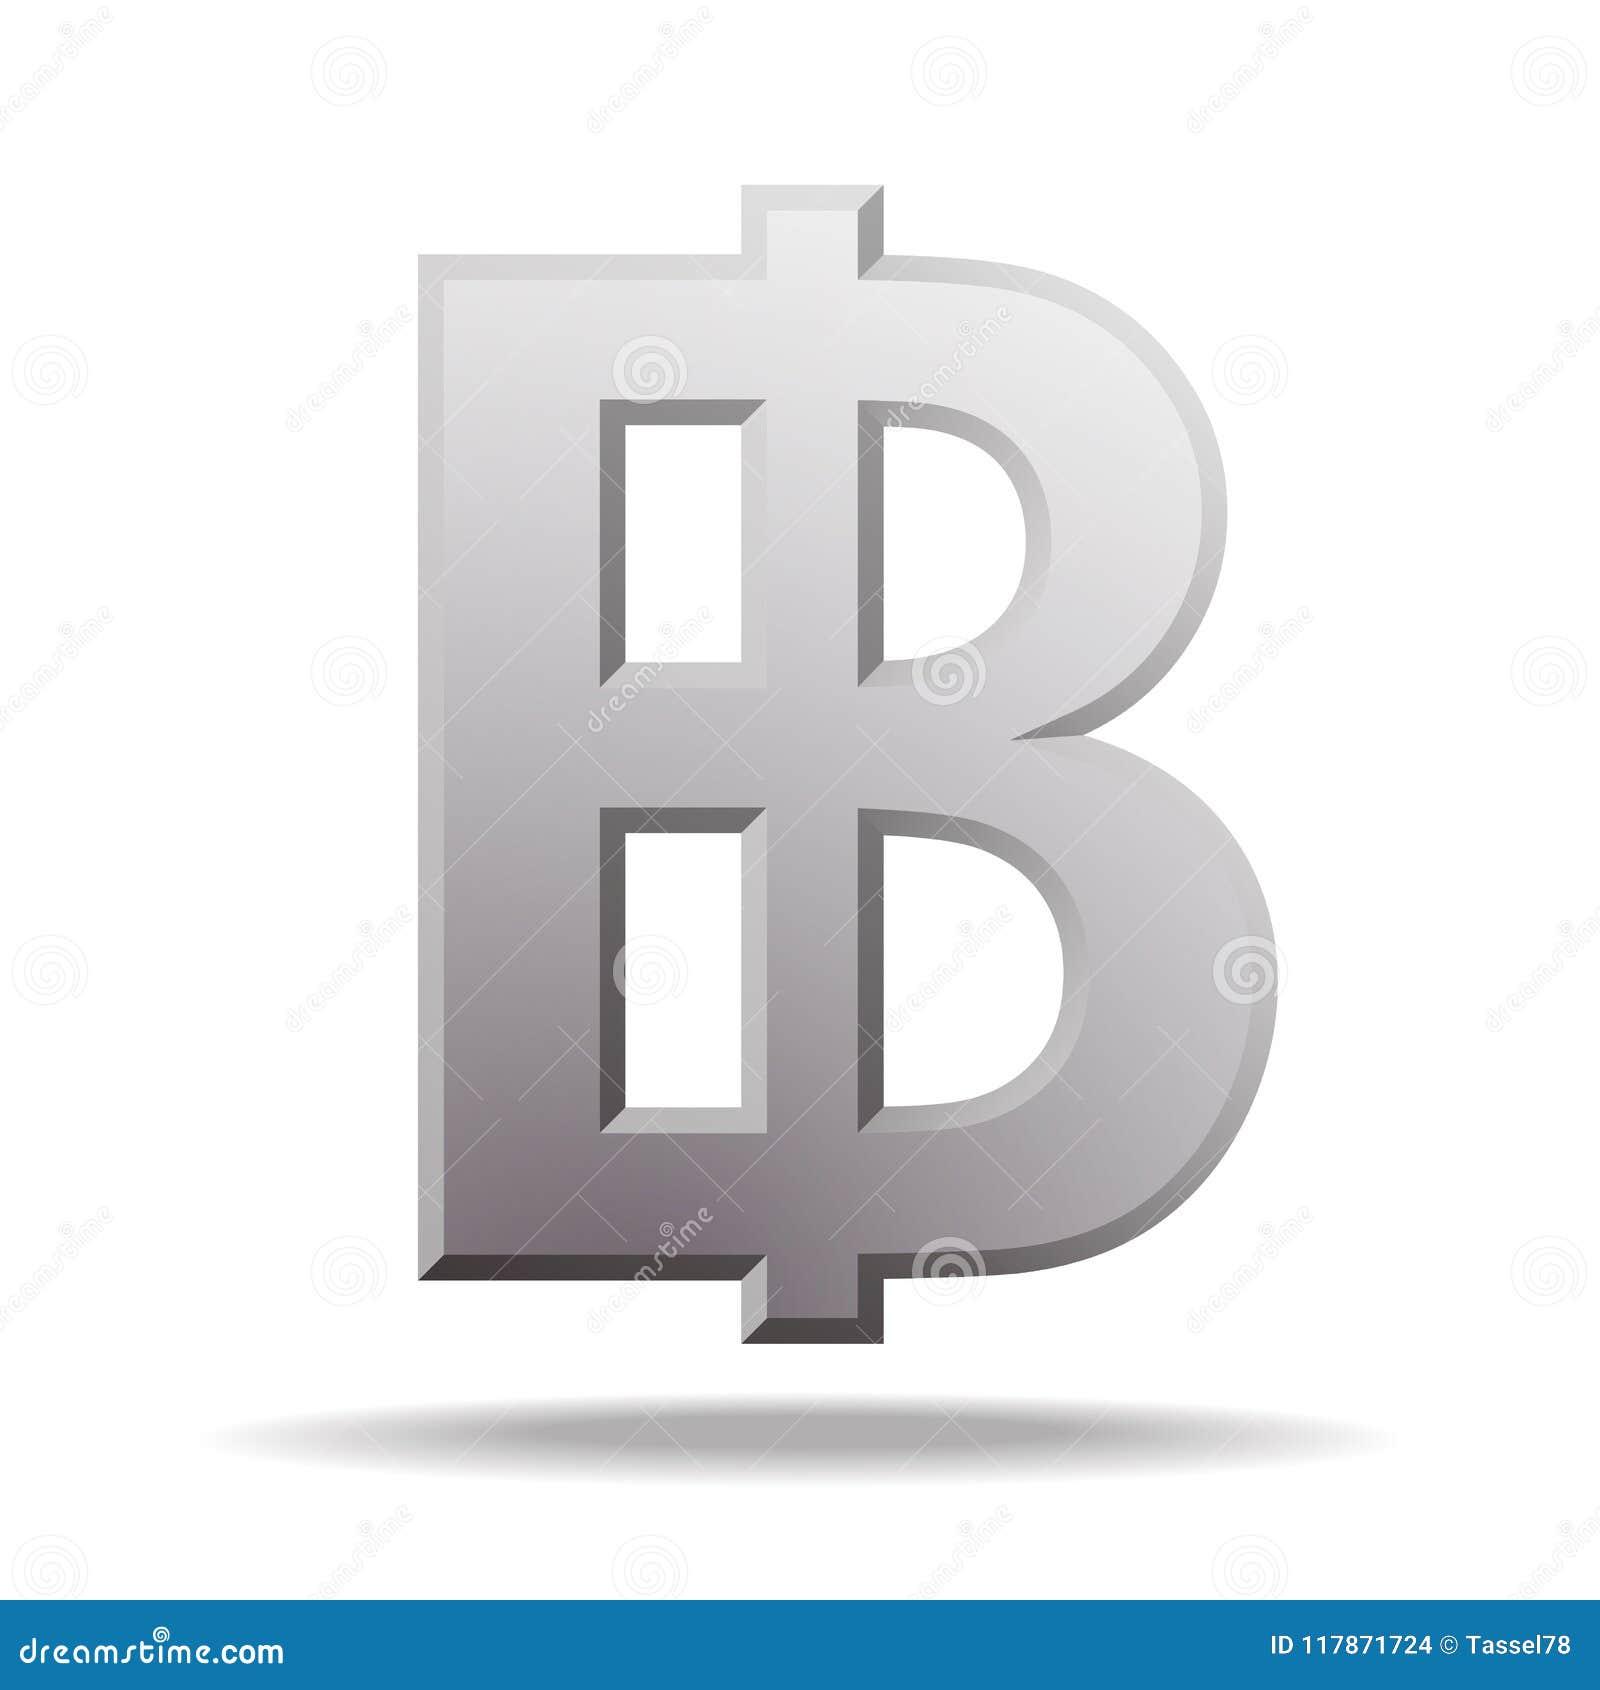 Thai Baht Currency Symbol Stock Vector Illustration Of Economy